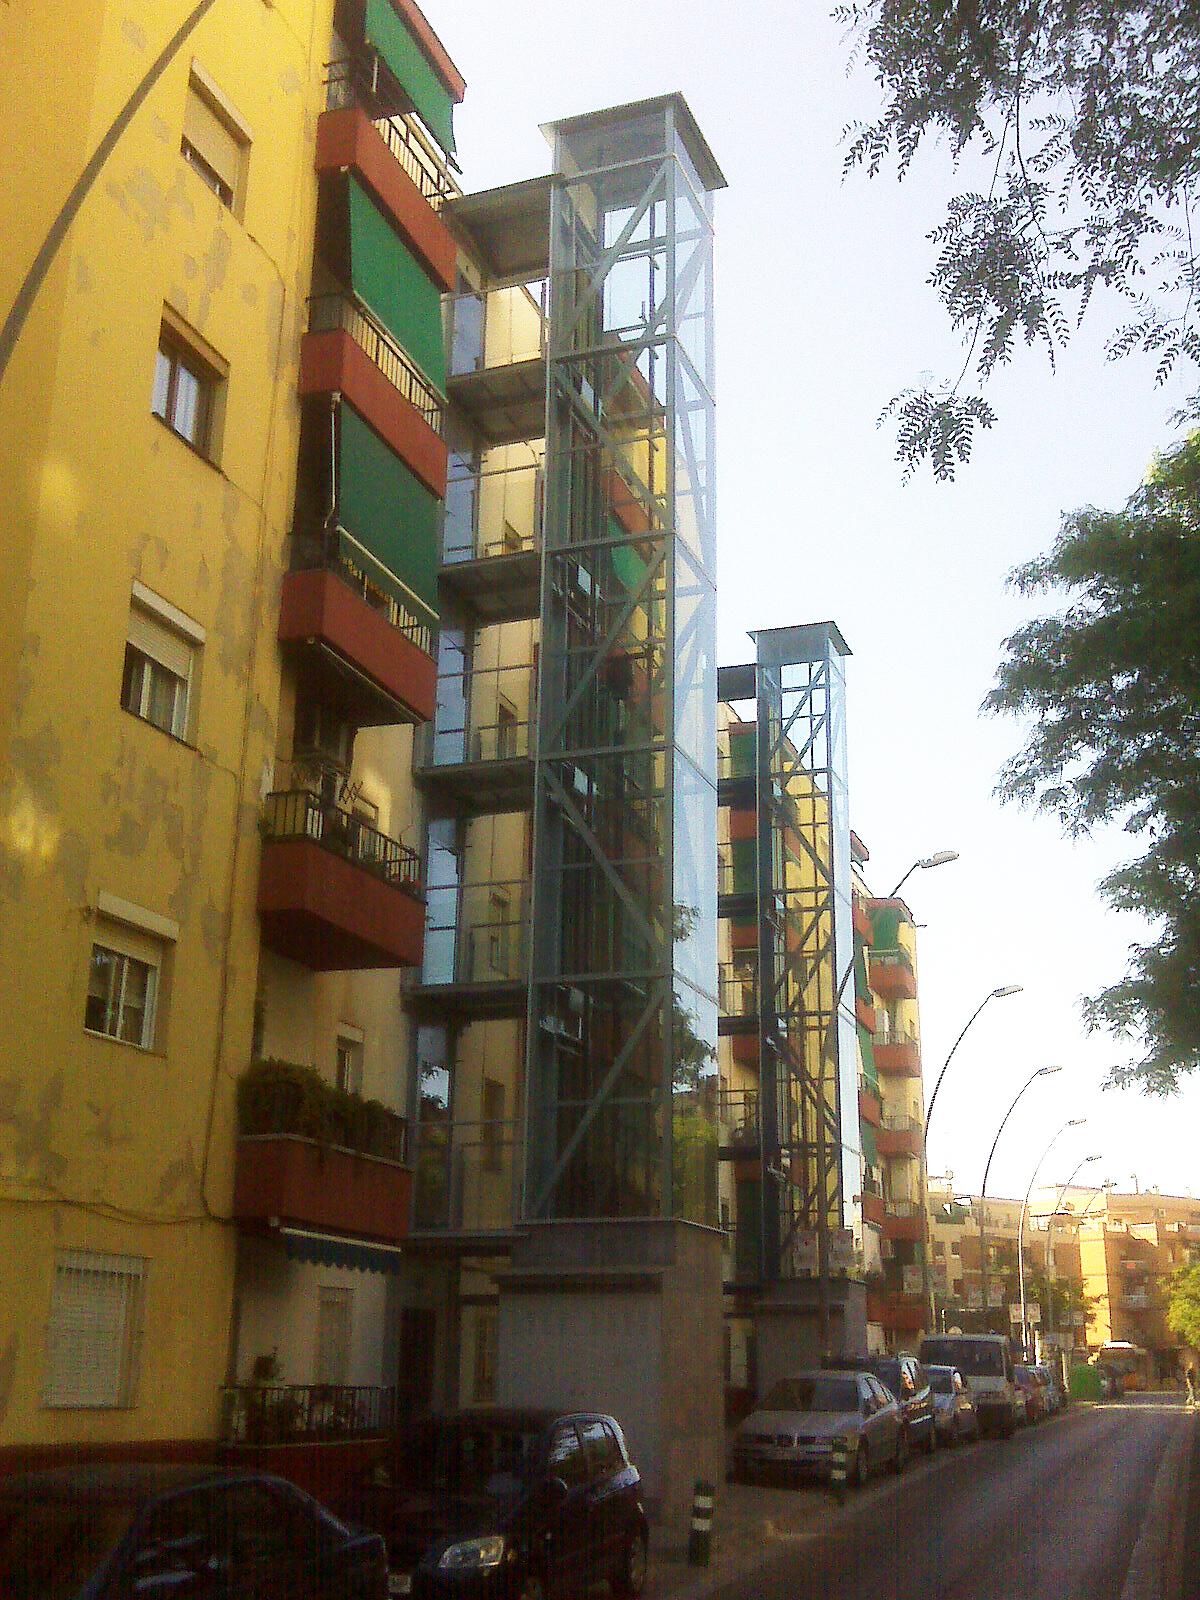 Estructura exterior unida al edificio a través de pasarelas (Sant Boi, BCN)